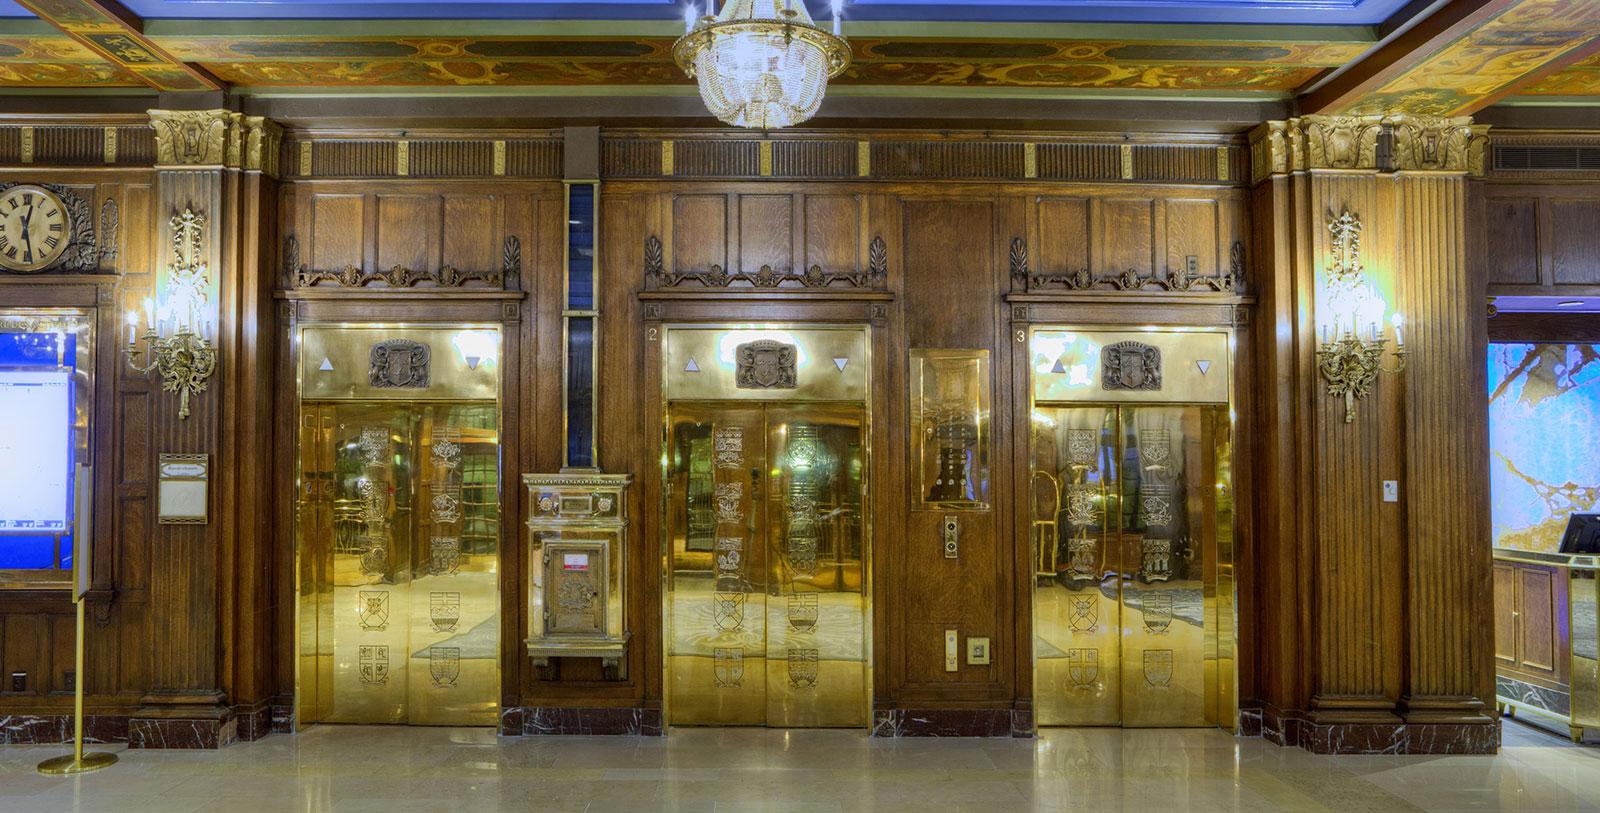 Image of Lobby Elevators, Fairmont Le Château Frontenac, 1893, Member of Historic Hotels Worldwide, in Québec City, Quebec, Hot Deals